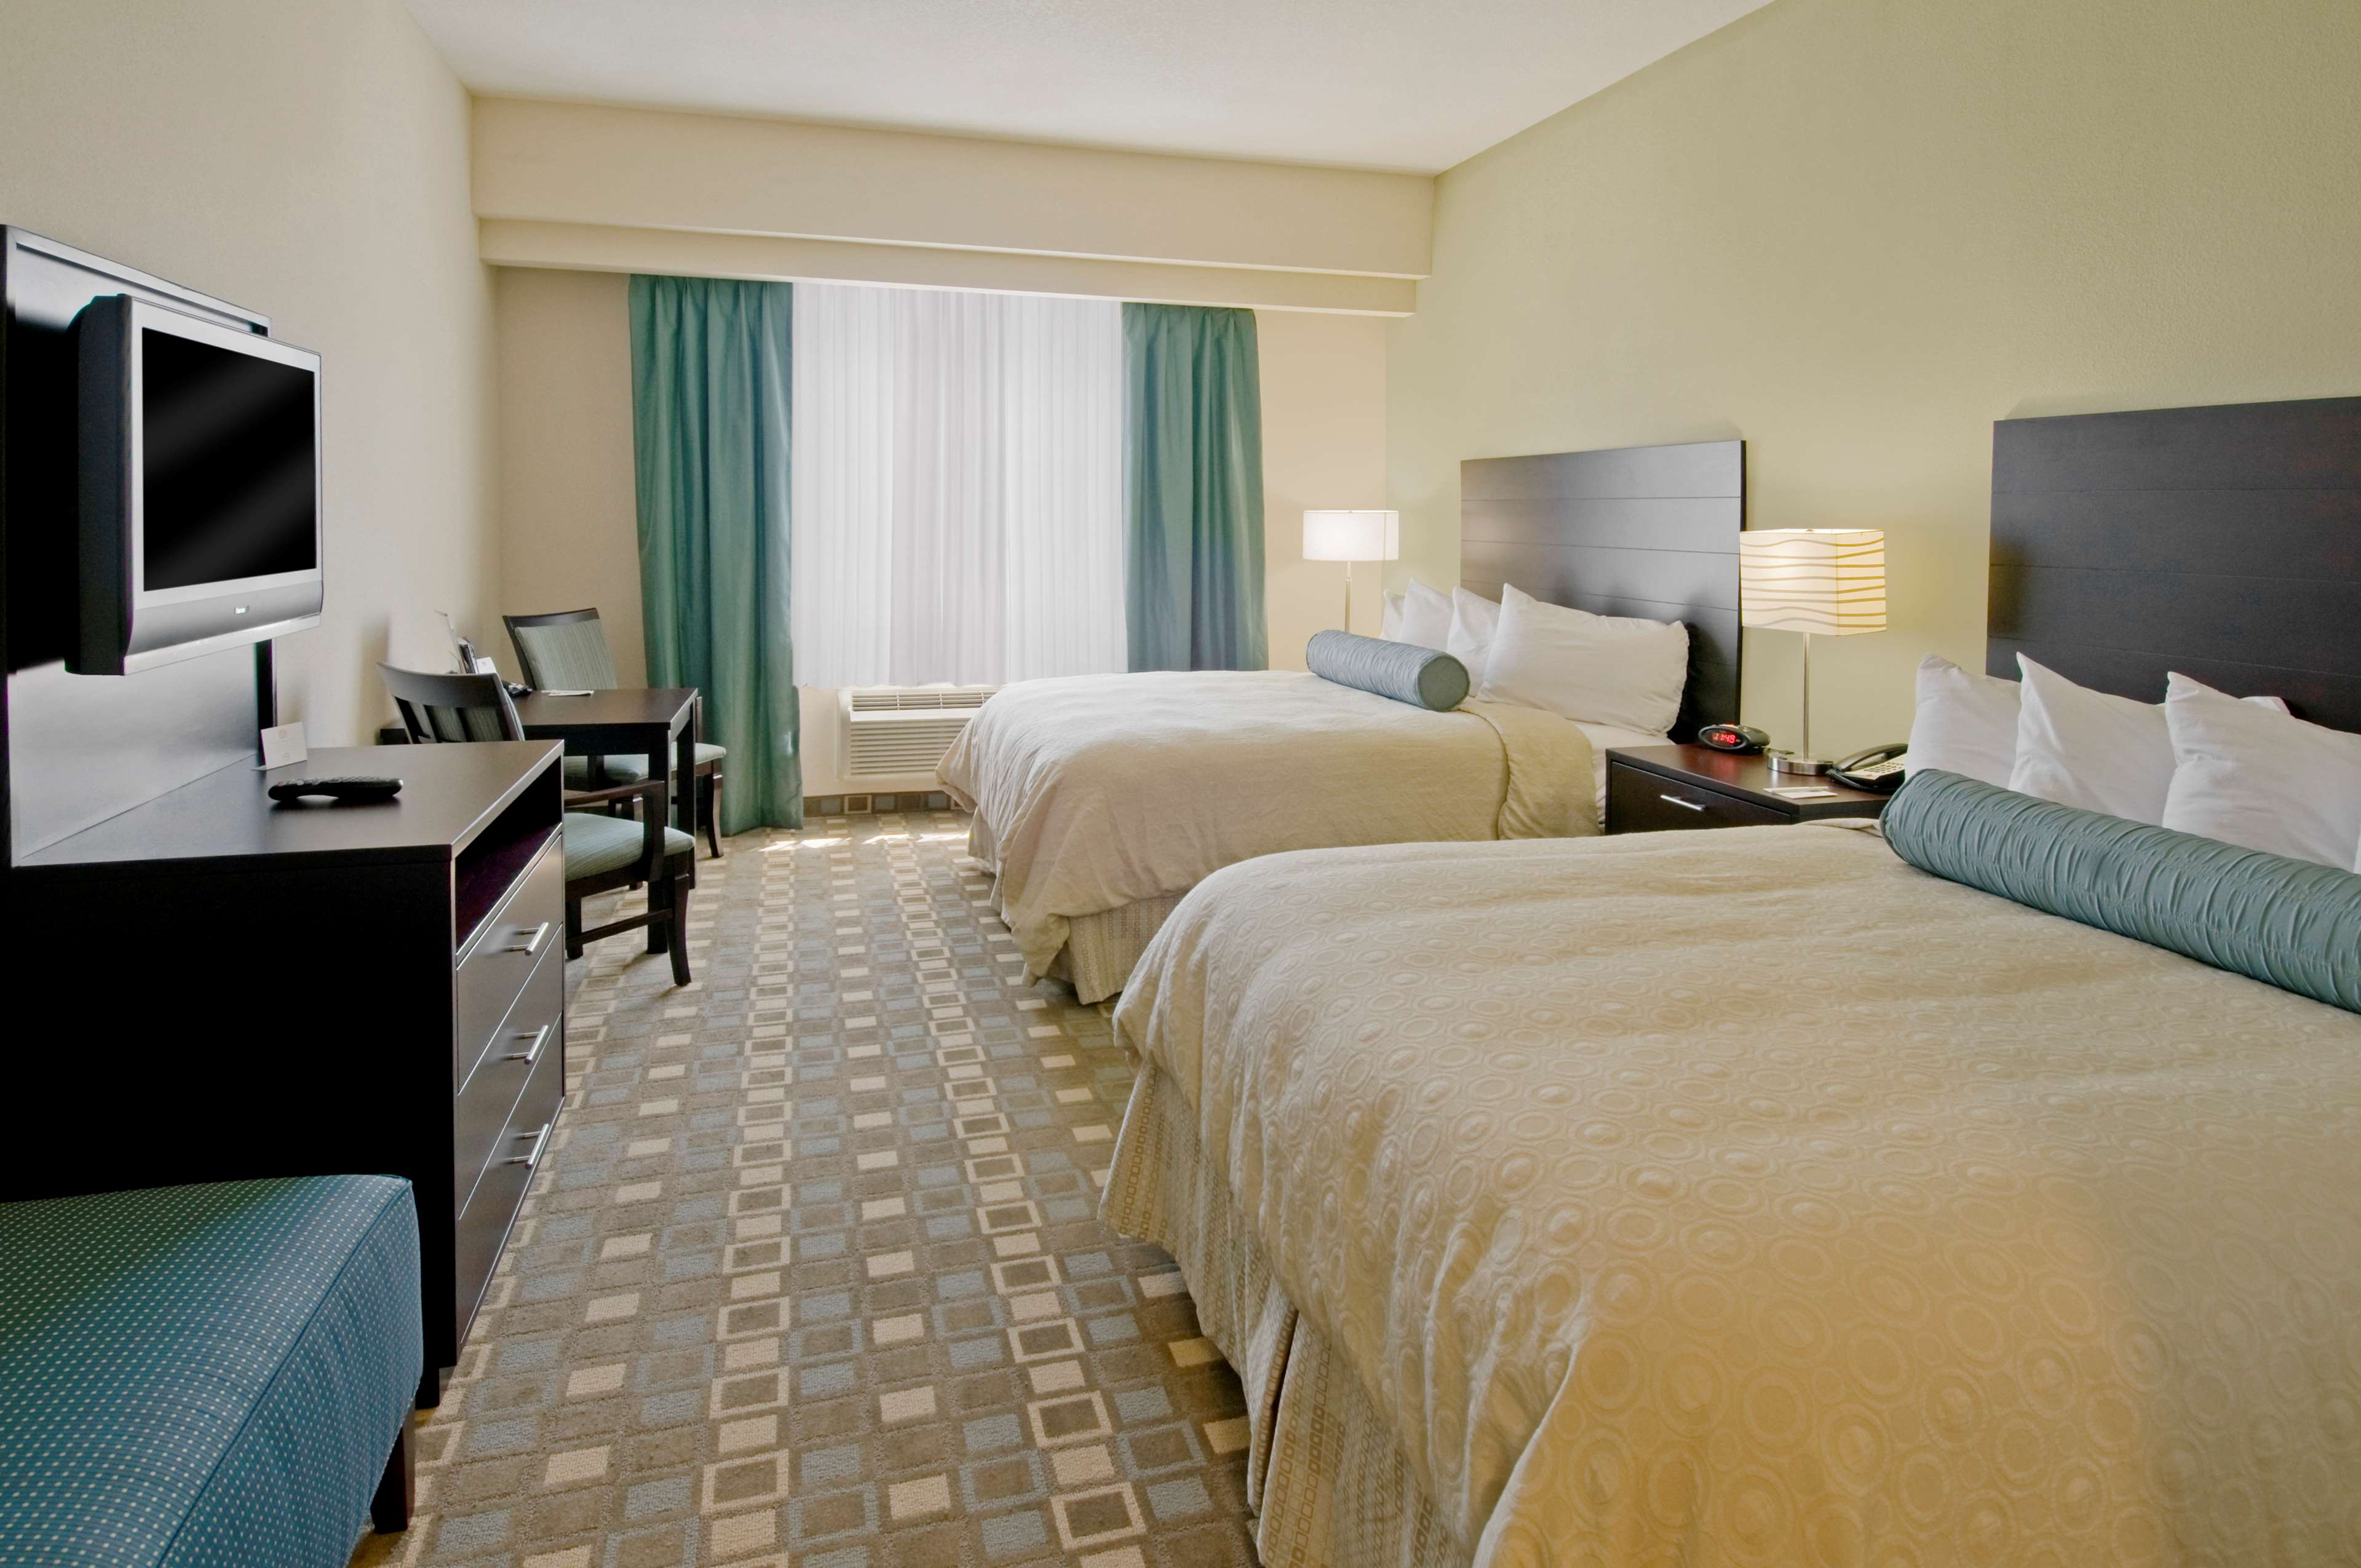 Best Western Plus Fort Lauderdale Airport South Inn & Suites image 10